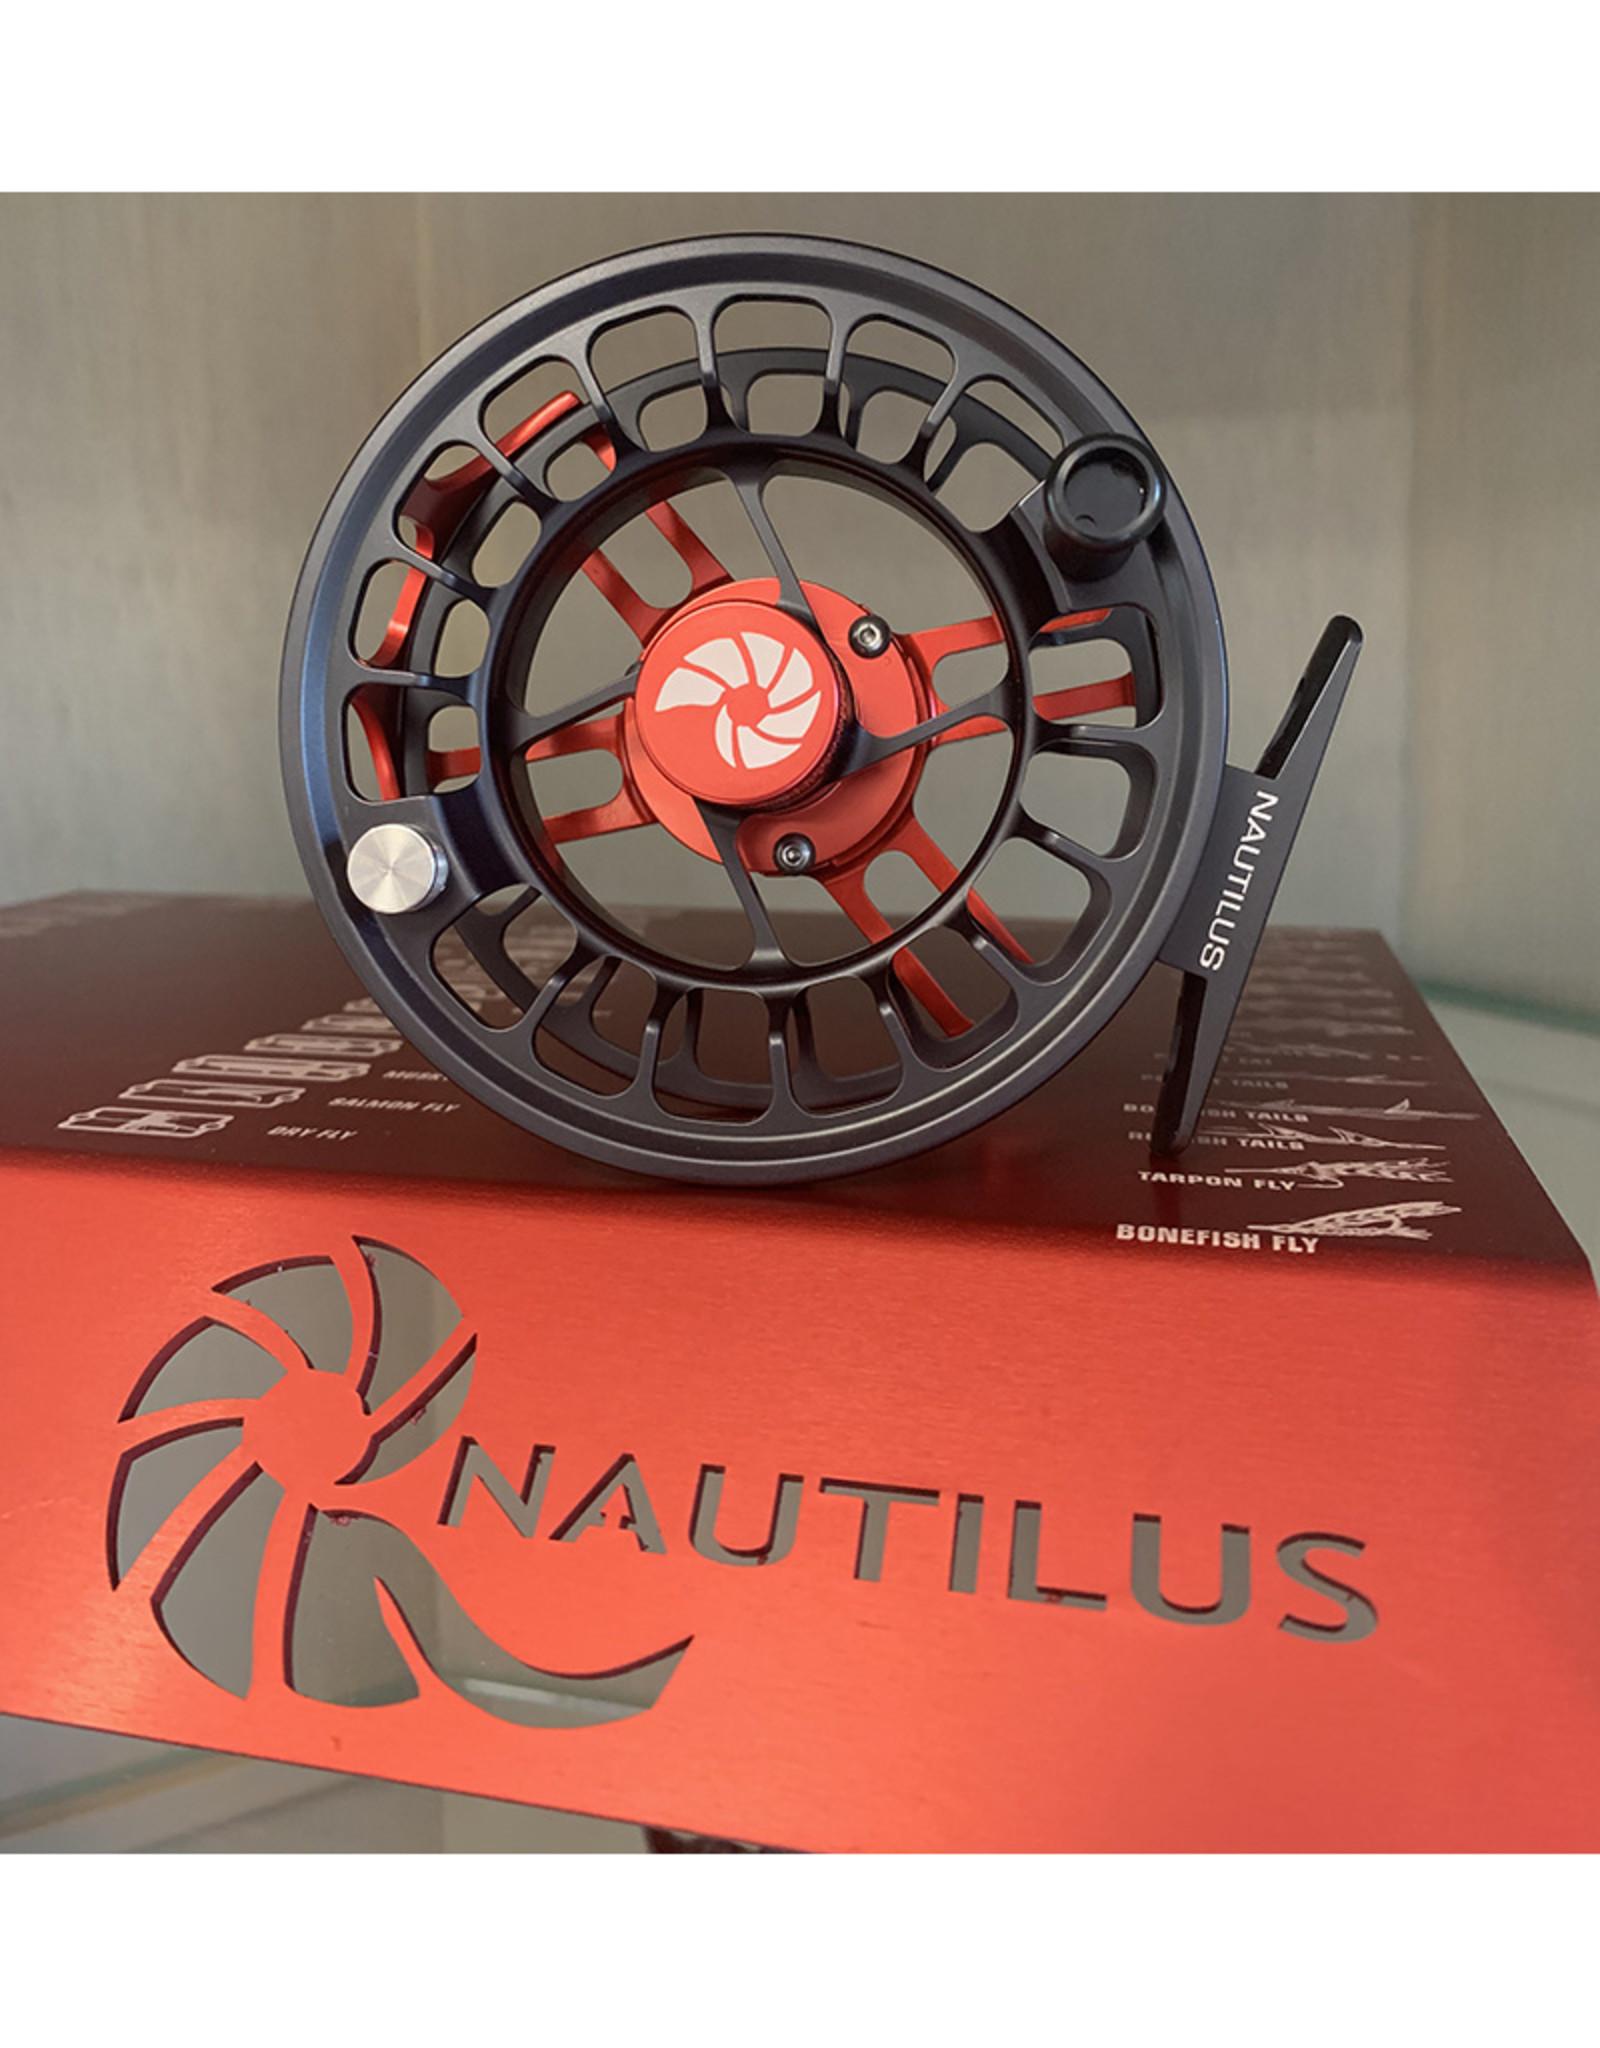 Nautilus X-Series Custom: Red Frame XL